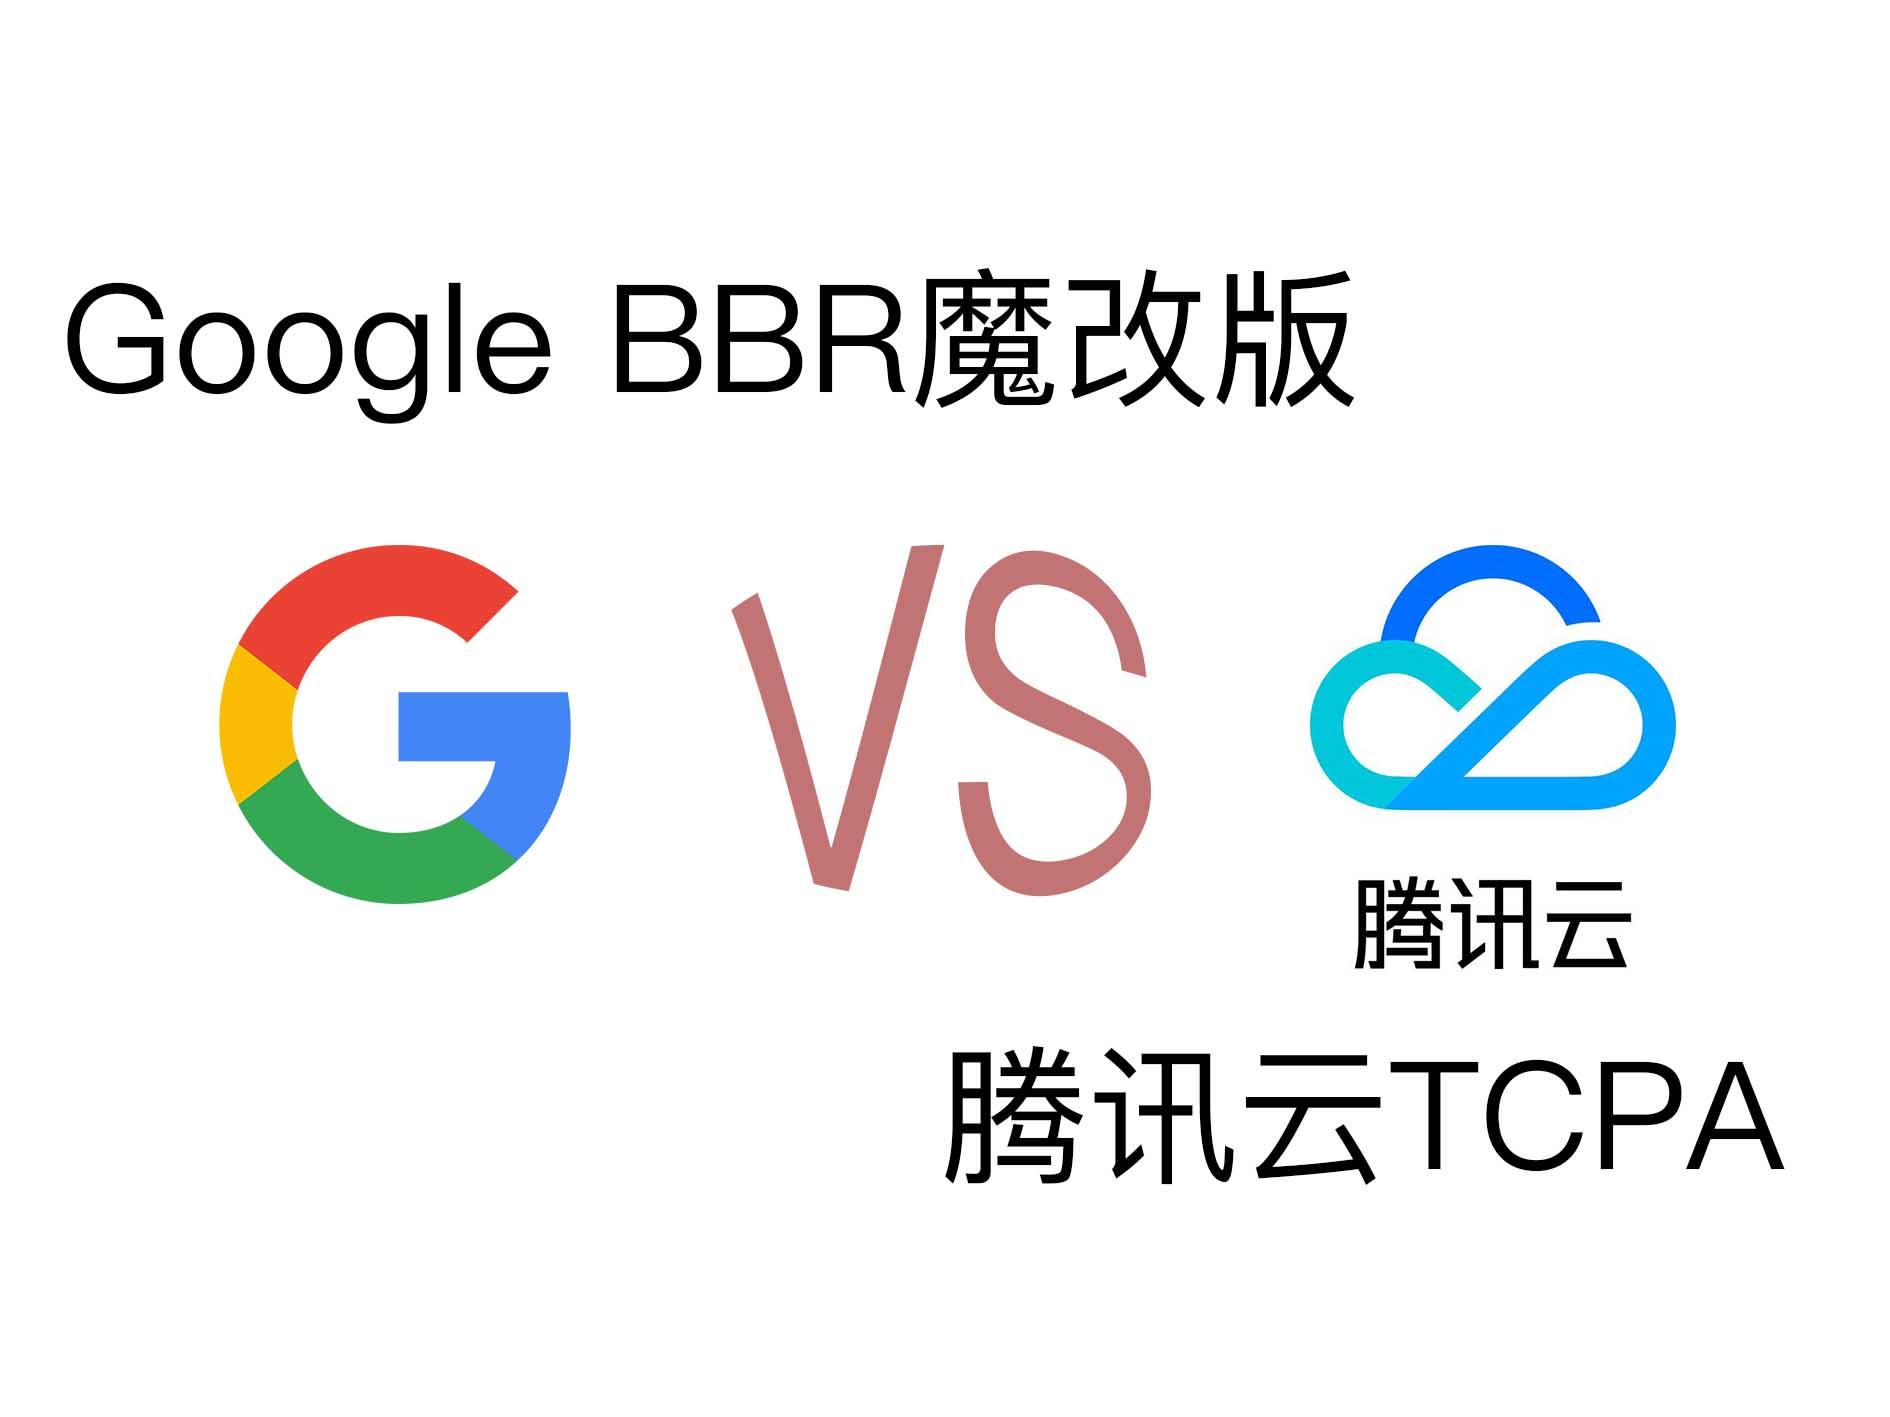 BBR魔改版与腾讯TCPA在网页加载和Nextcloud大文件下载方面的性能对比